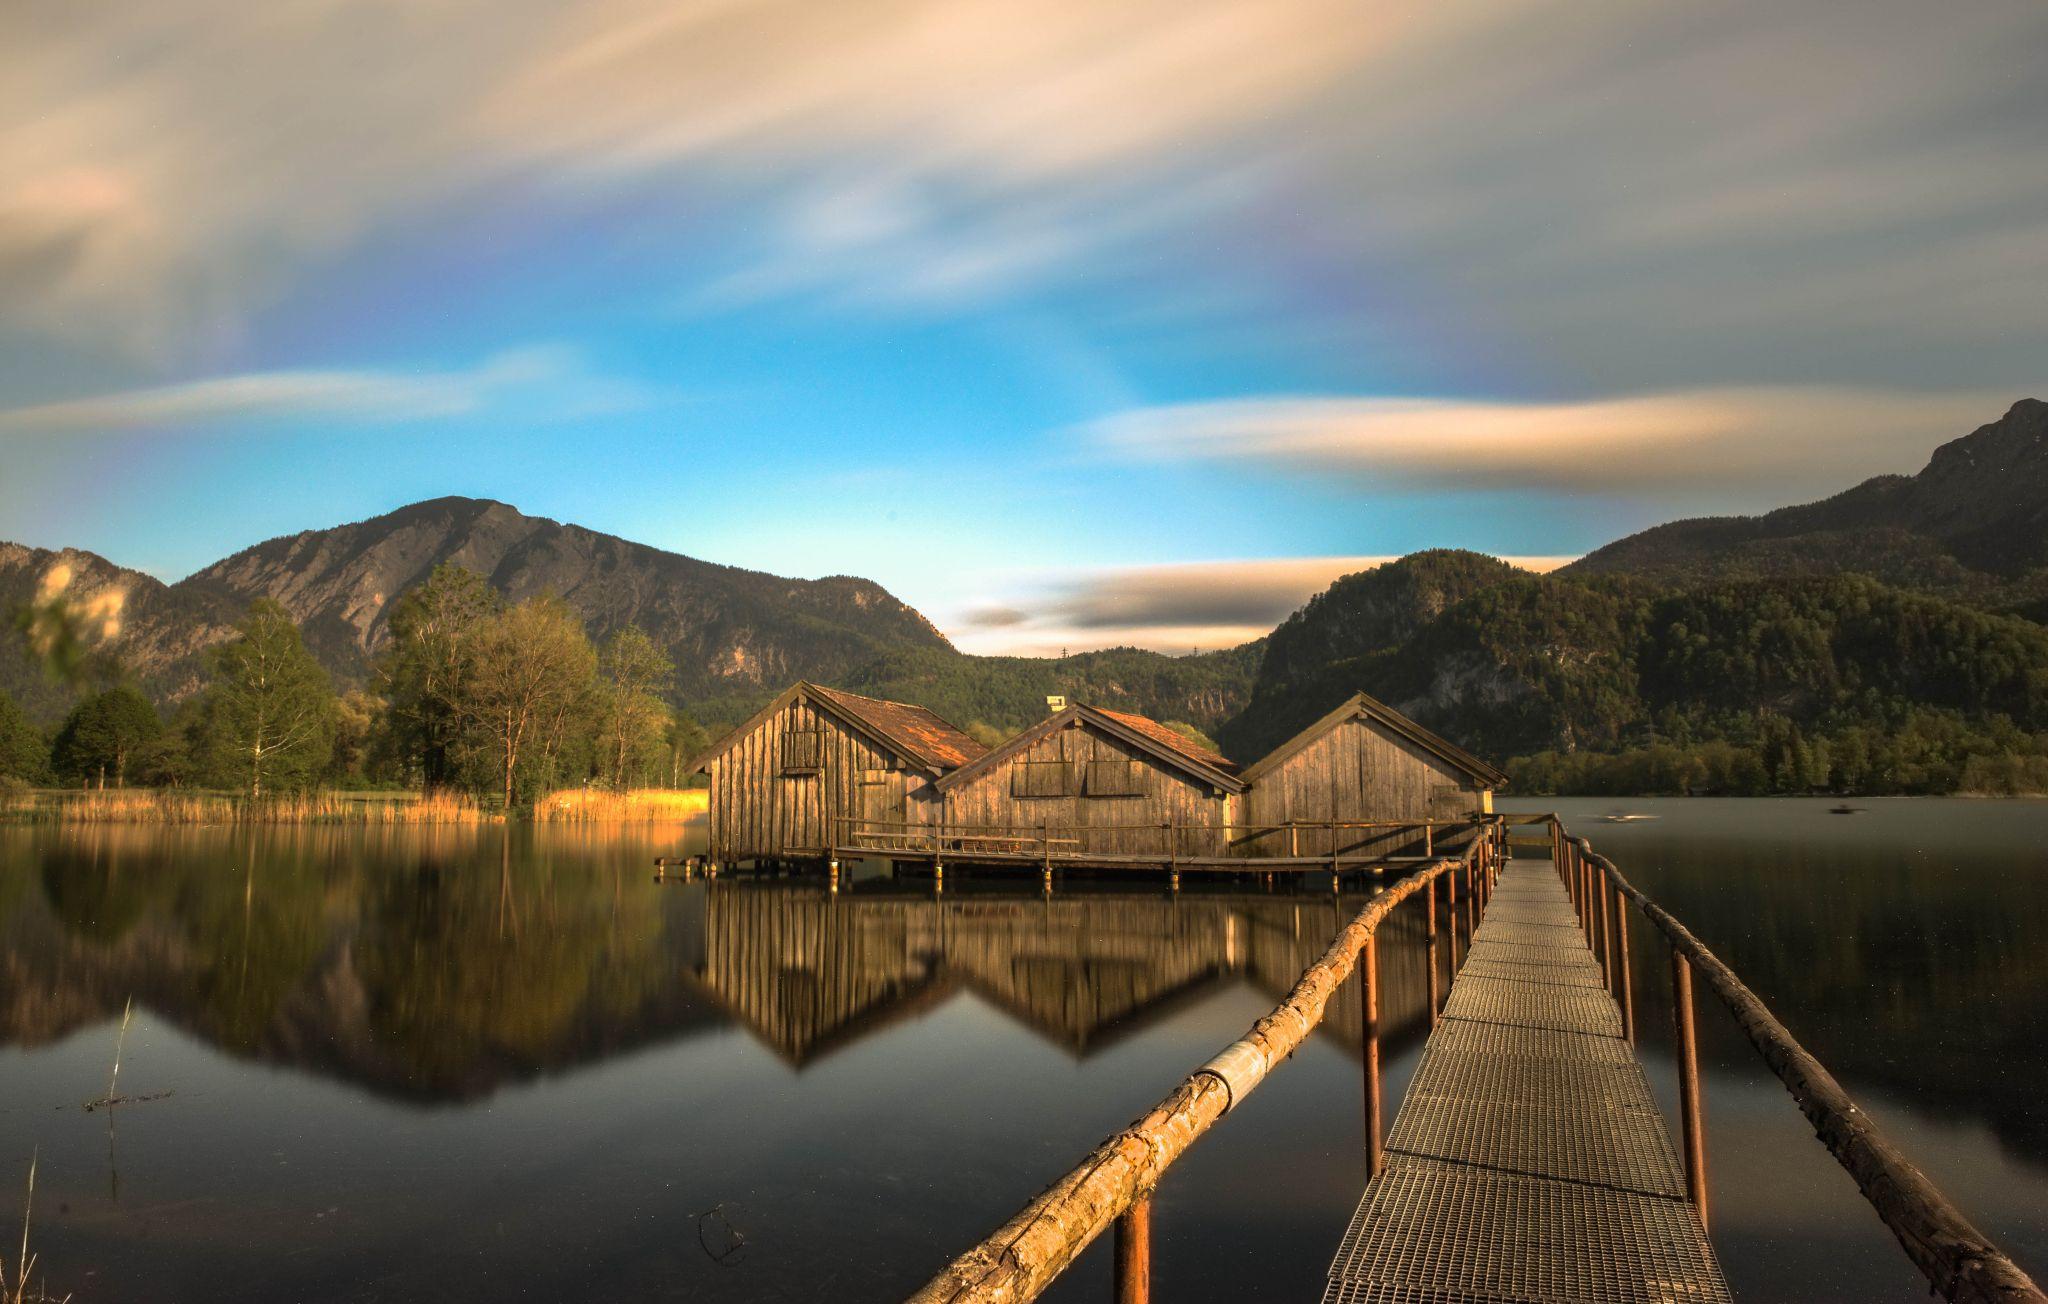 Boathouse at Kochelsee, Germany